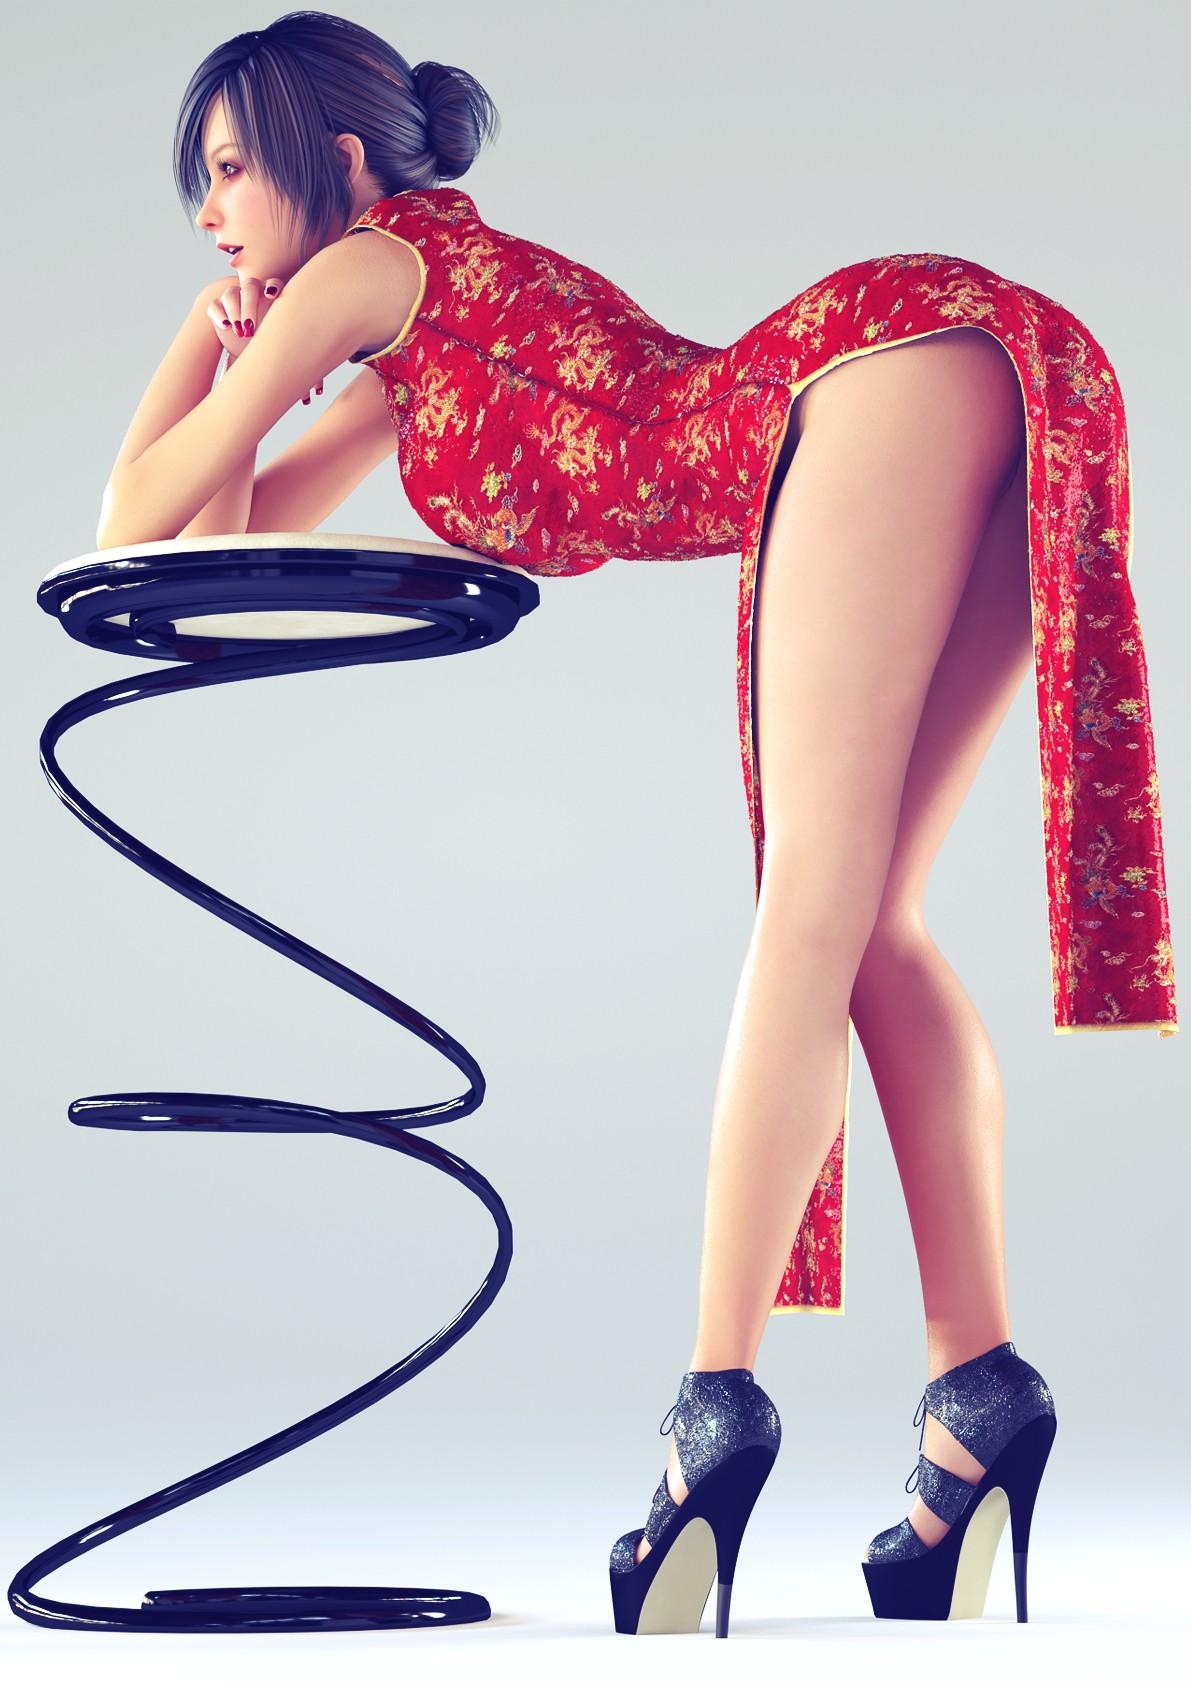 Kourtney kardashian larsa pippen black sexy mini dress legs photos